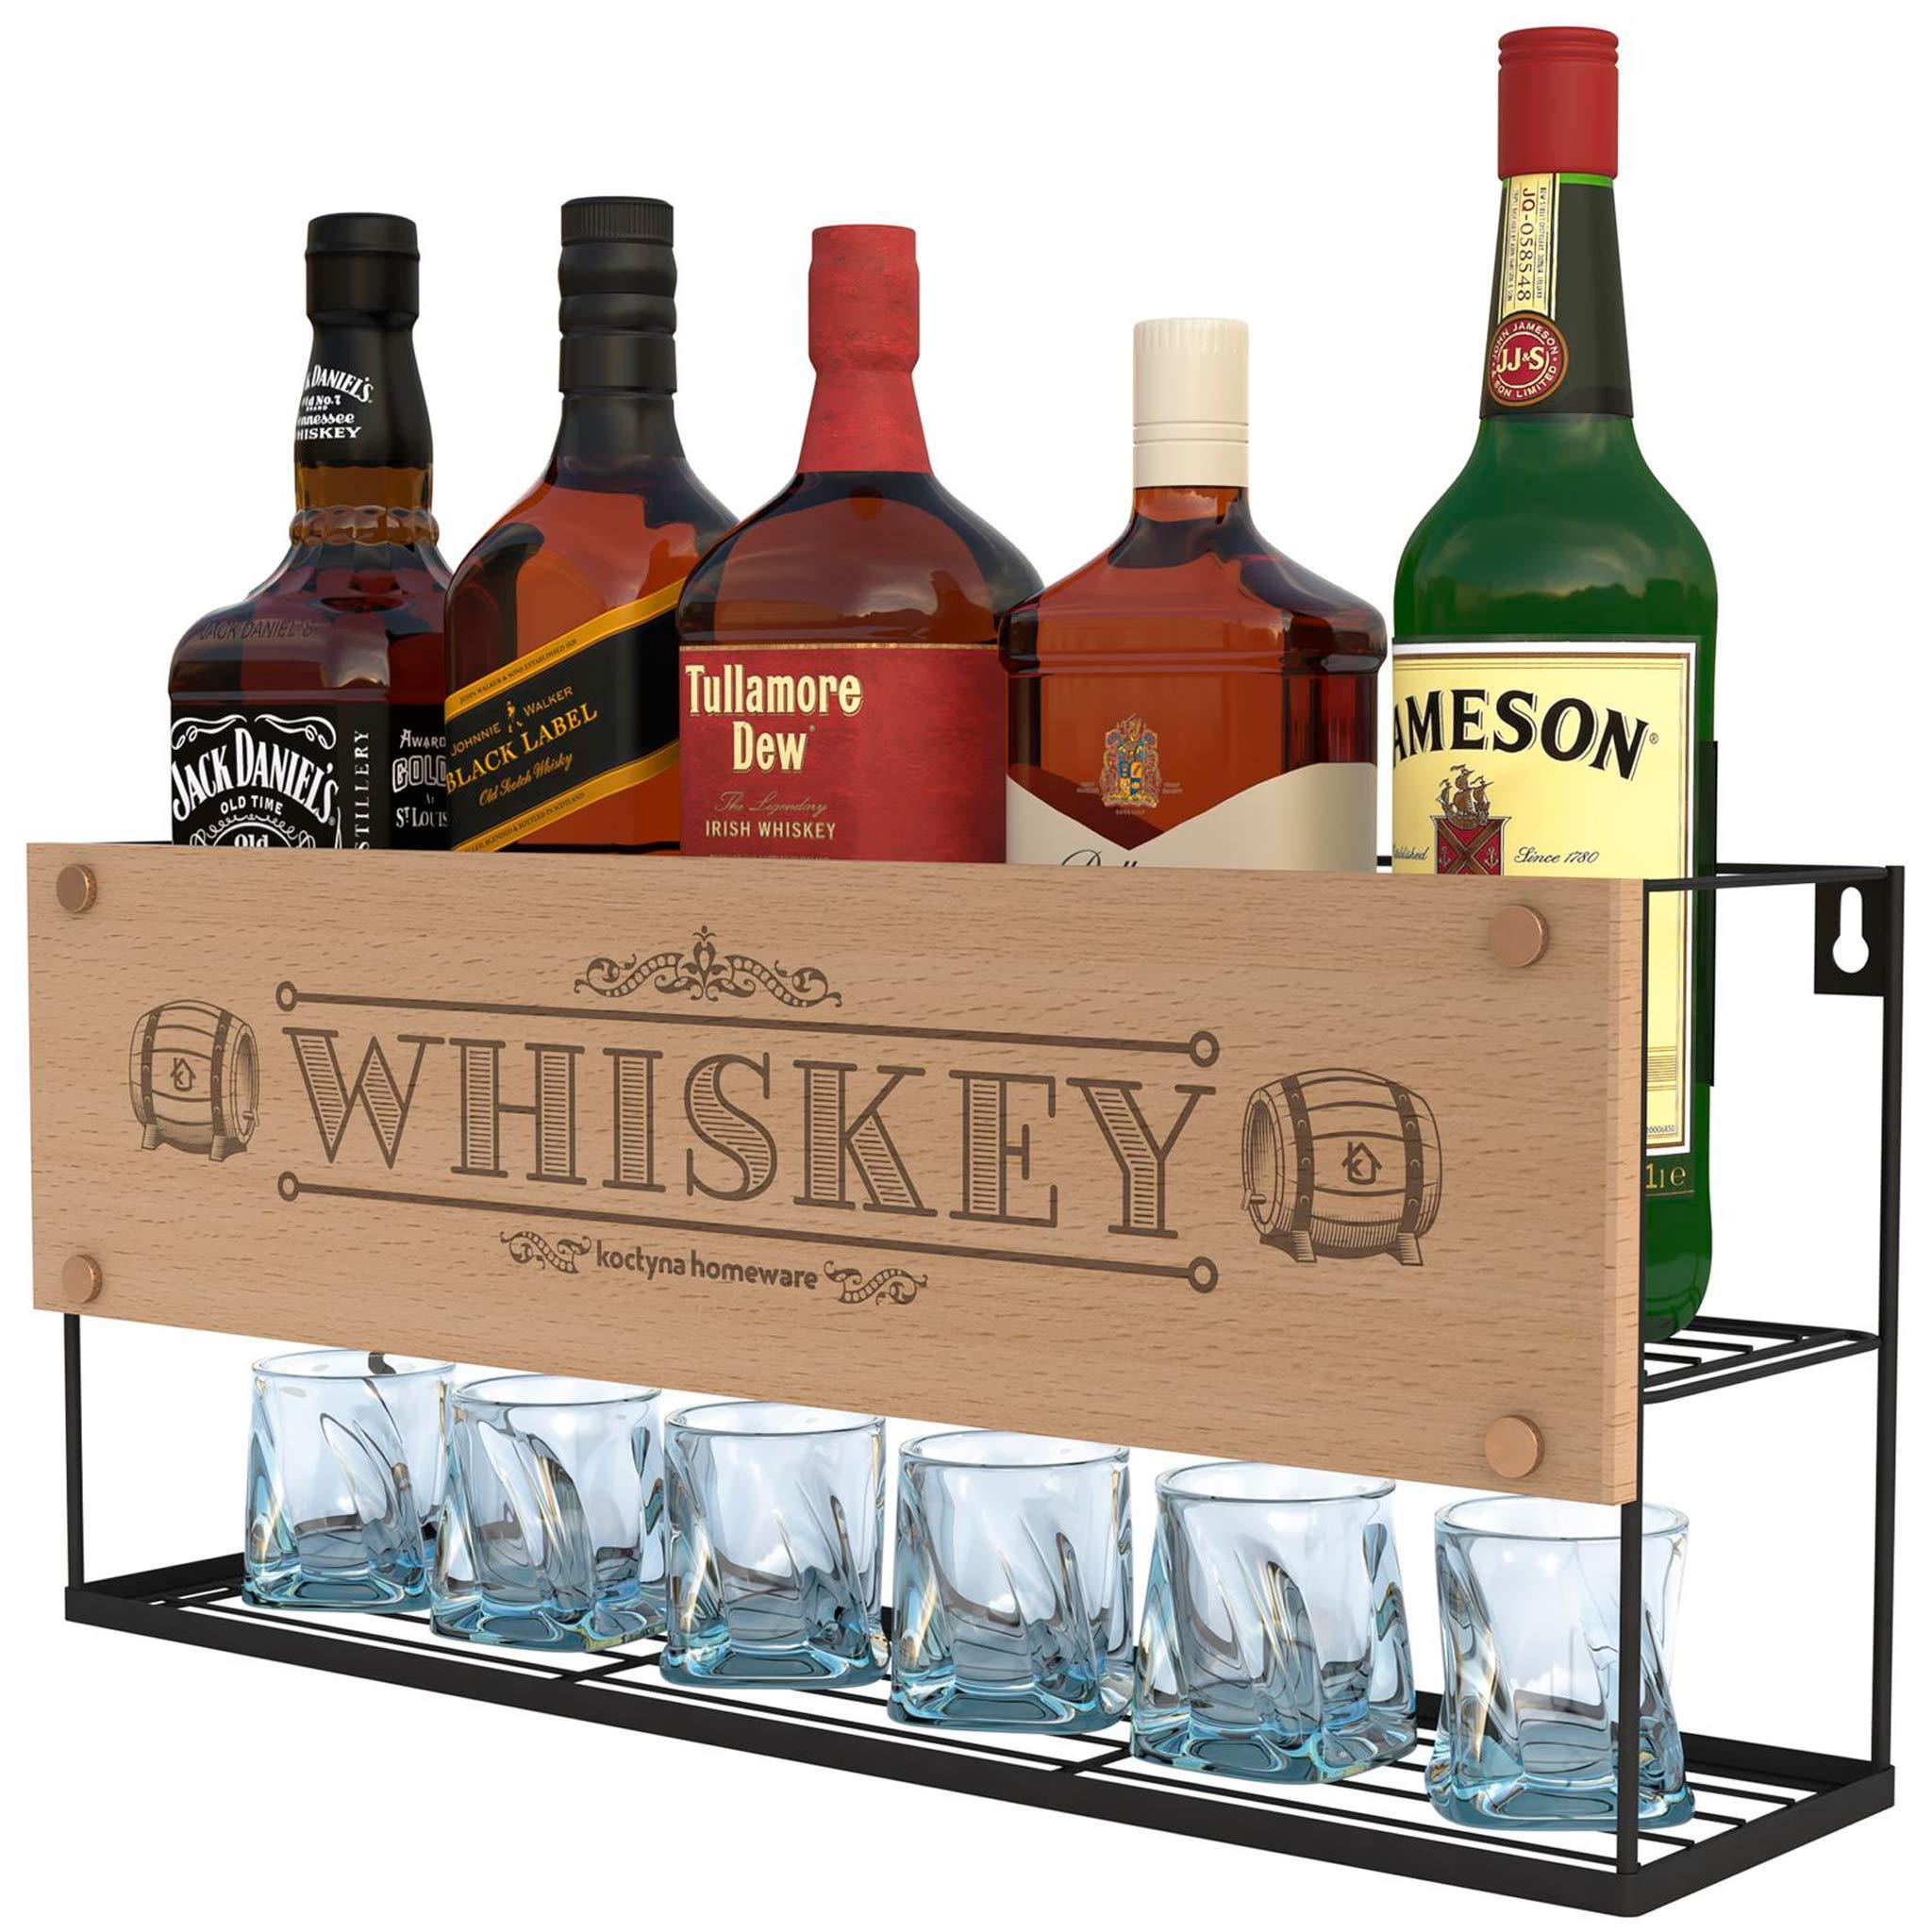 Wall Mounted Whiskey Racks | Bottle & Glass Holder | Whiskey Short Storage | Store Whiskey, Brandy, Сognac | Oak Whiskey Barrel Design | Whiskey Stones Holder | Home, Kitchen, Bar, Restorant Décor